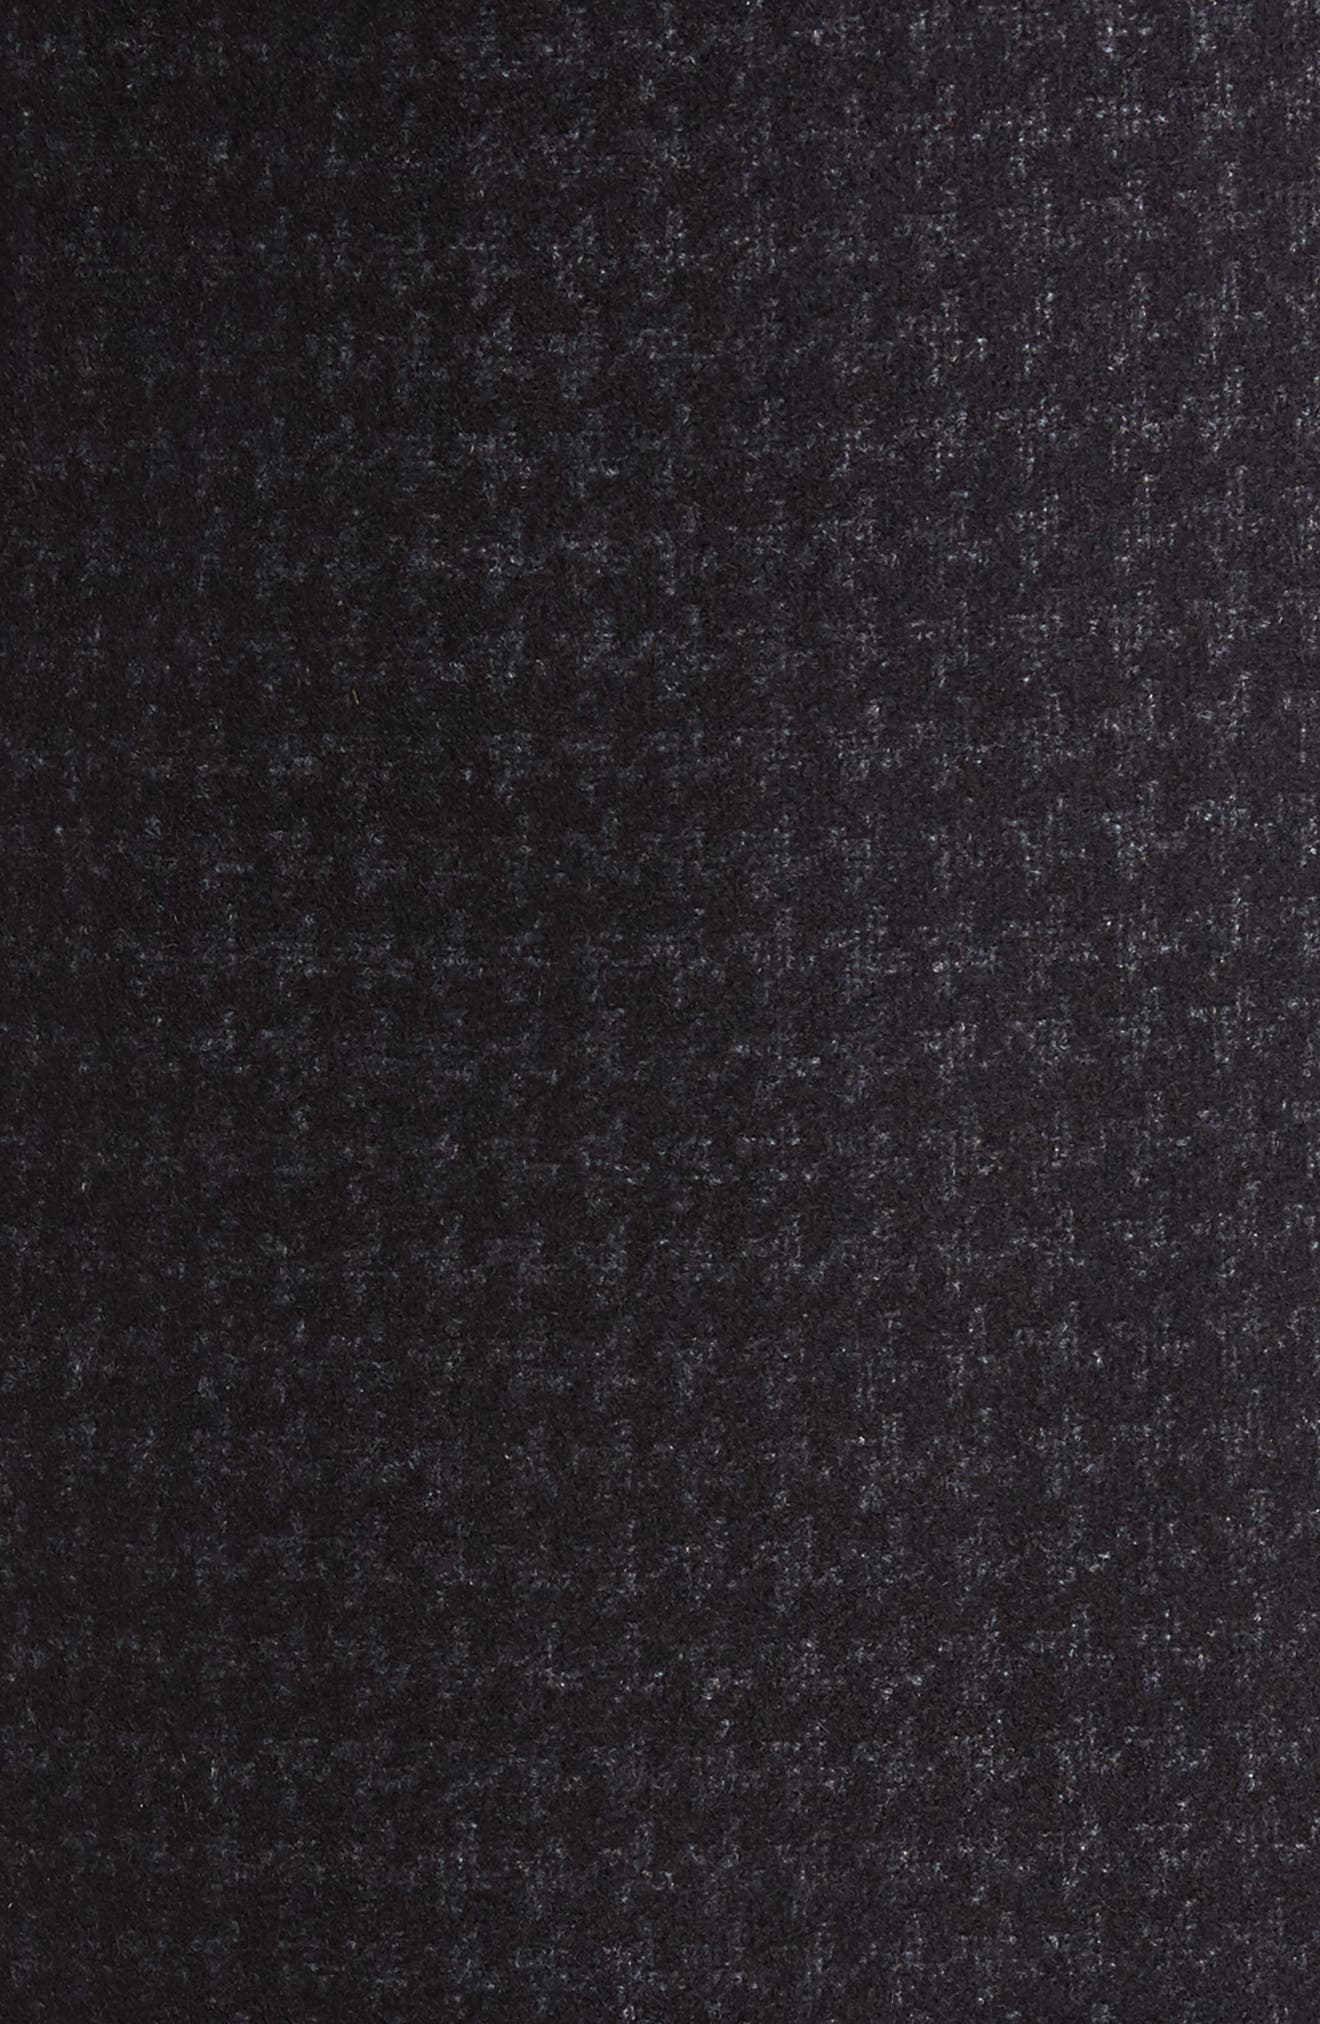 Jackson Houndstooth Wool Blend Overcoat,                             Alternate thumbnail 6, color,